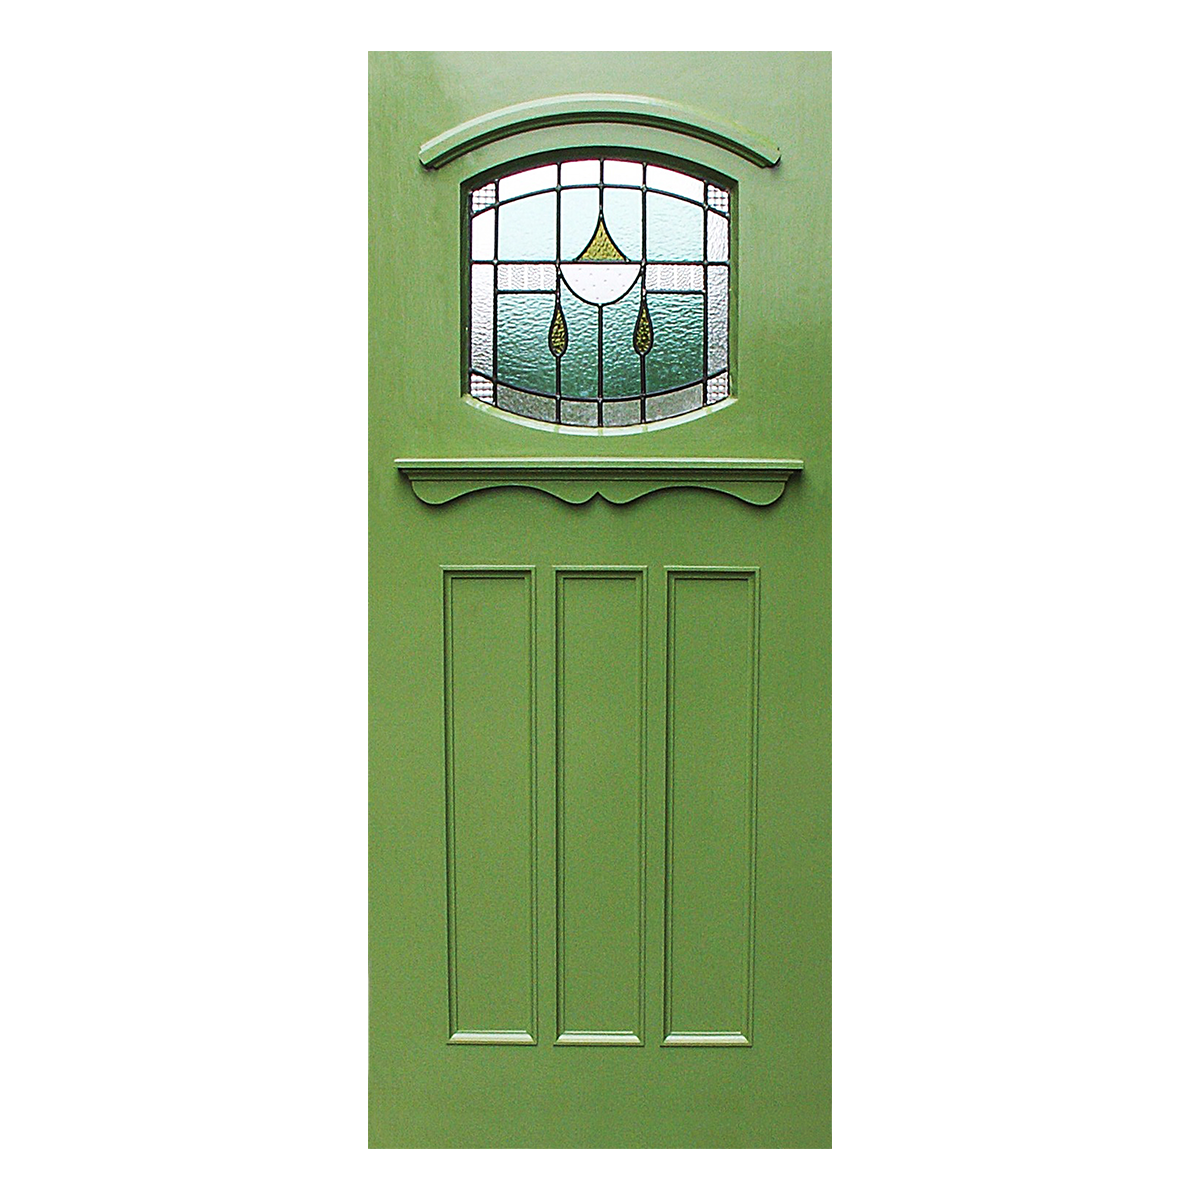 SOD11 The Savoy  sc 1 st  Pinterest & SOD11 The Savoy | Front doors | Pinterest | Shop doors Front ...